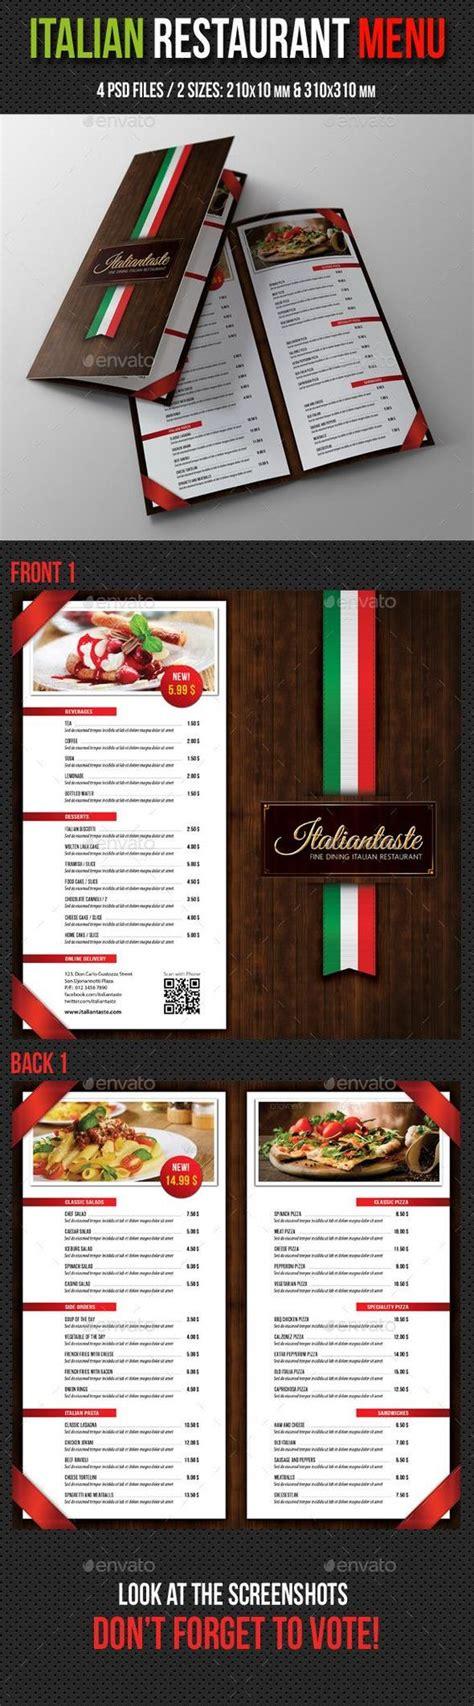 italian restaurant menu template italian brochures and restaurant on